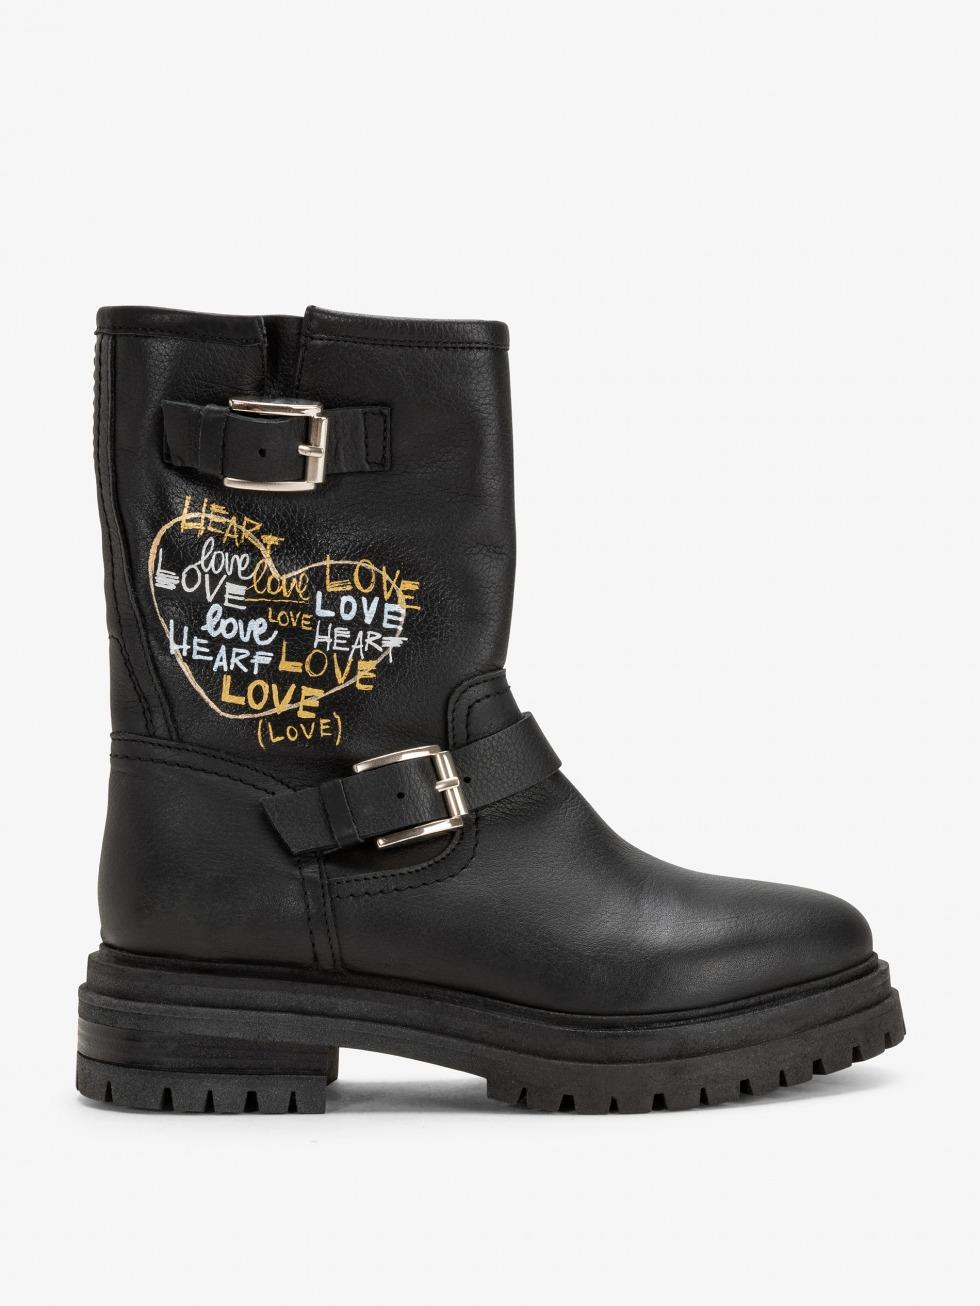 Sidecar Boots - Heart Raven Writer